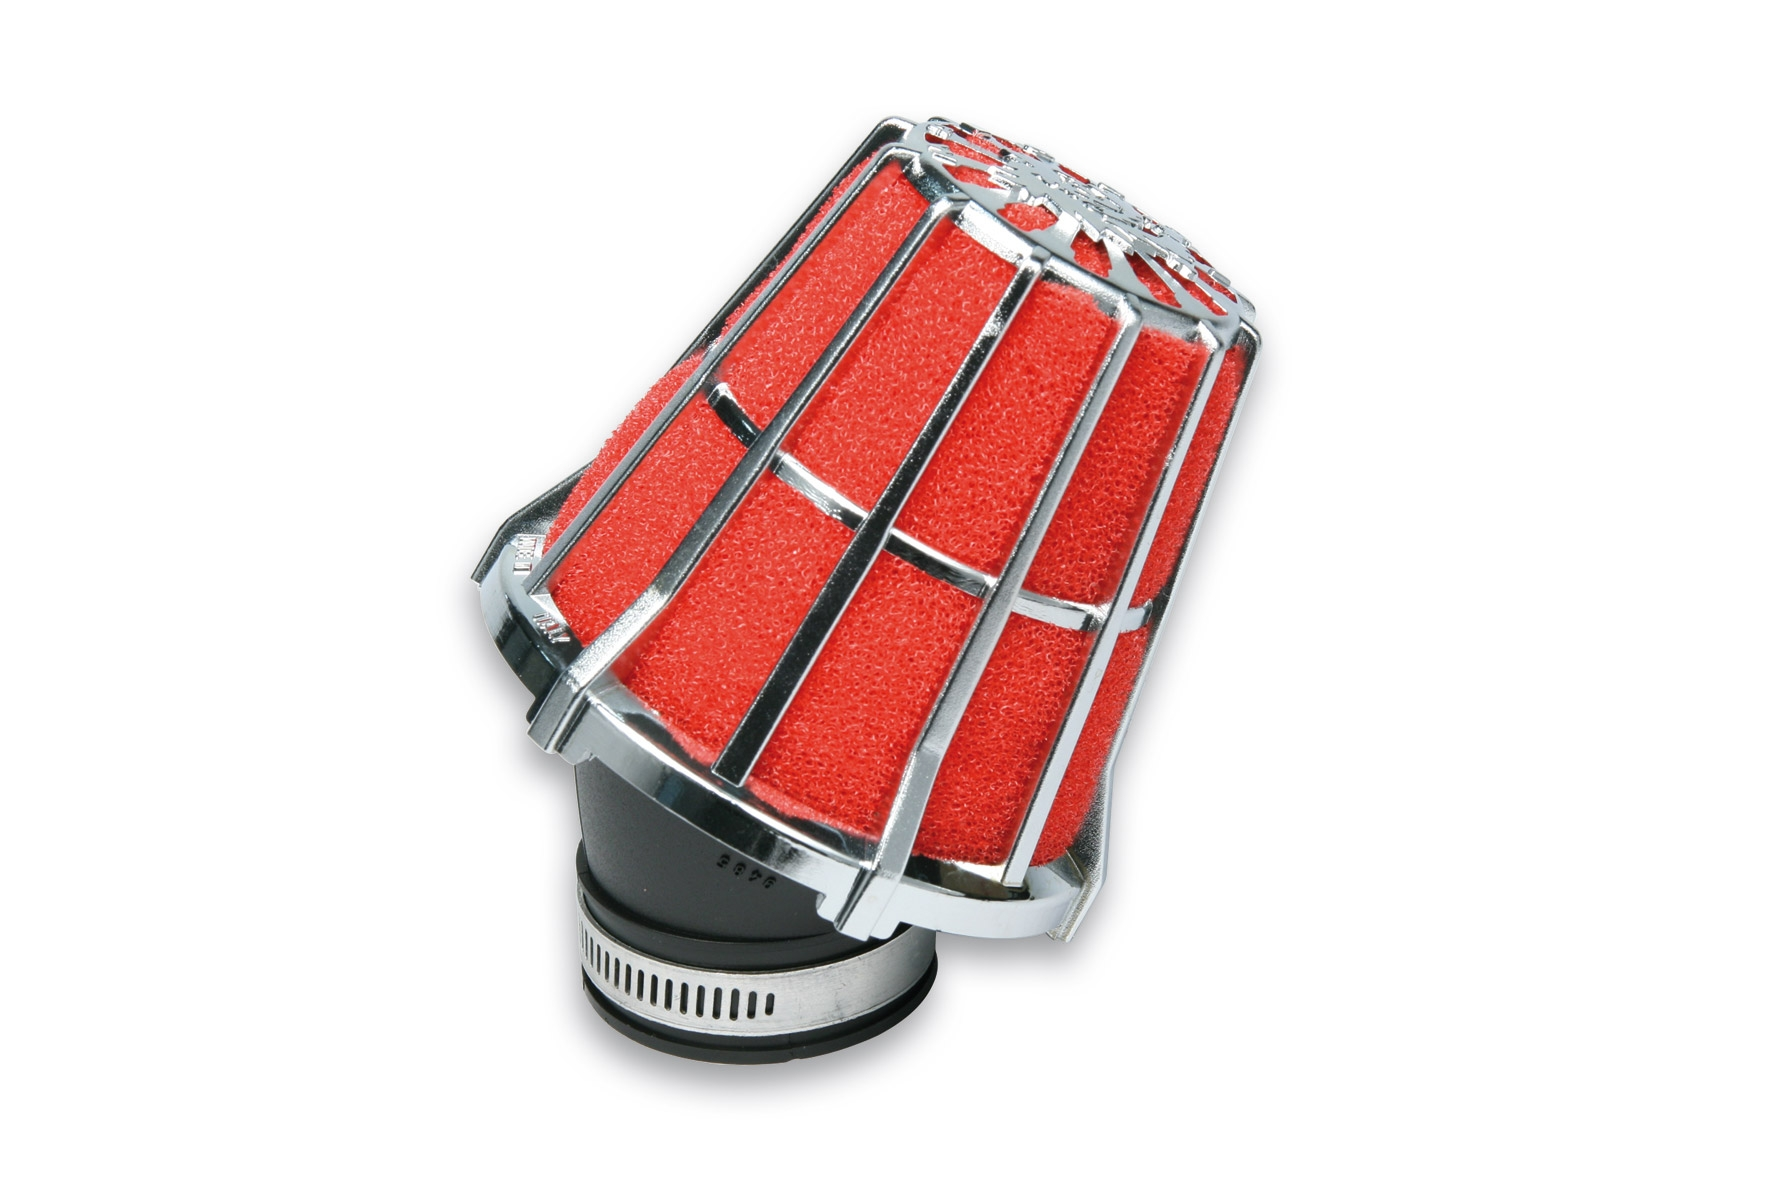 Filtre à air Malossi Red Filter E5 D.48 incliné 30 chromé